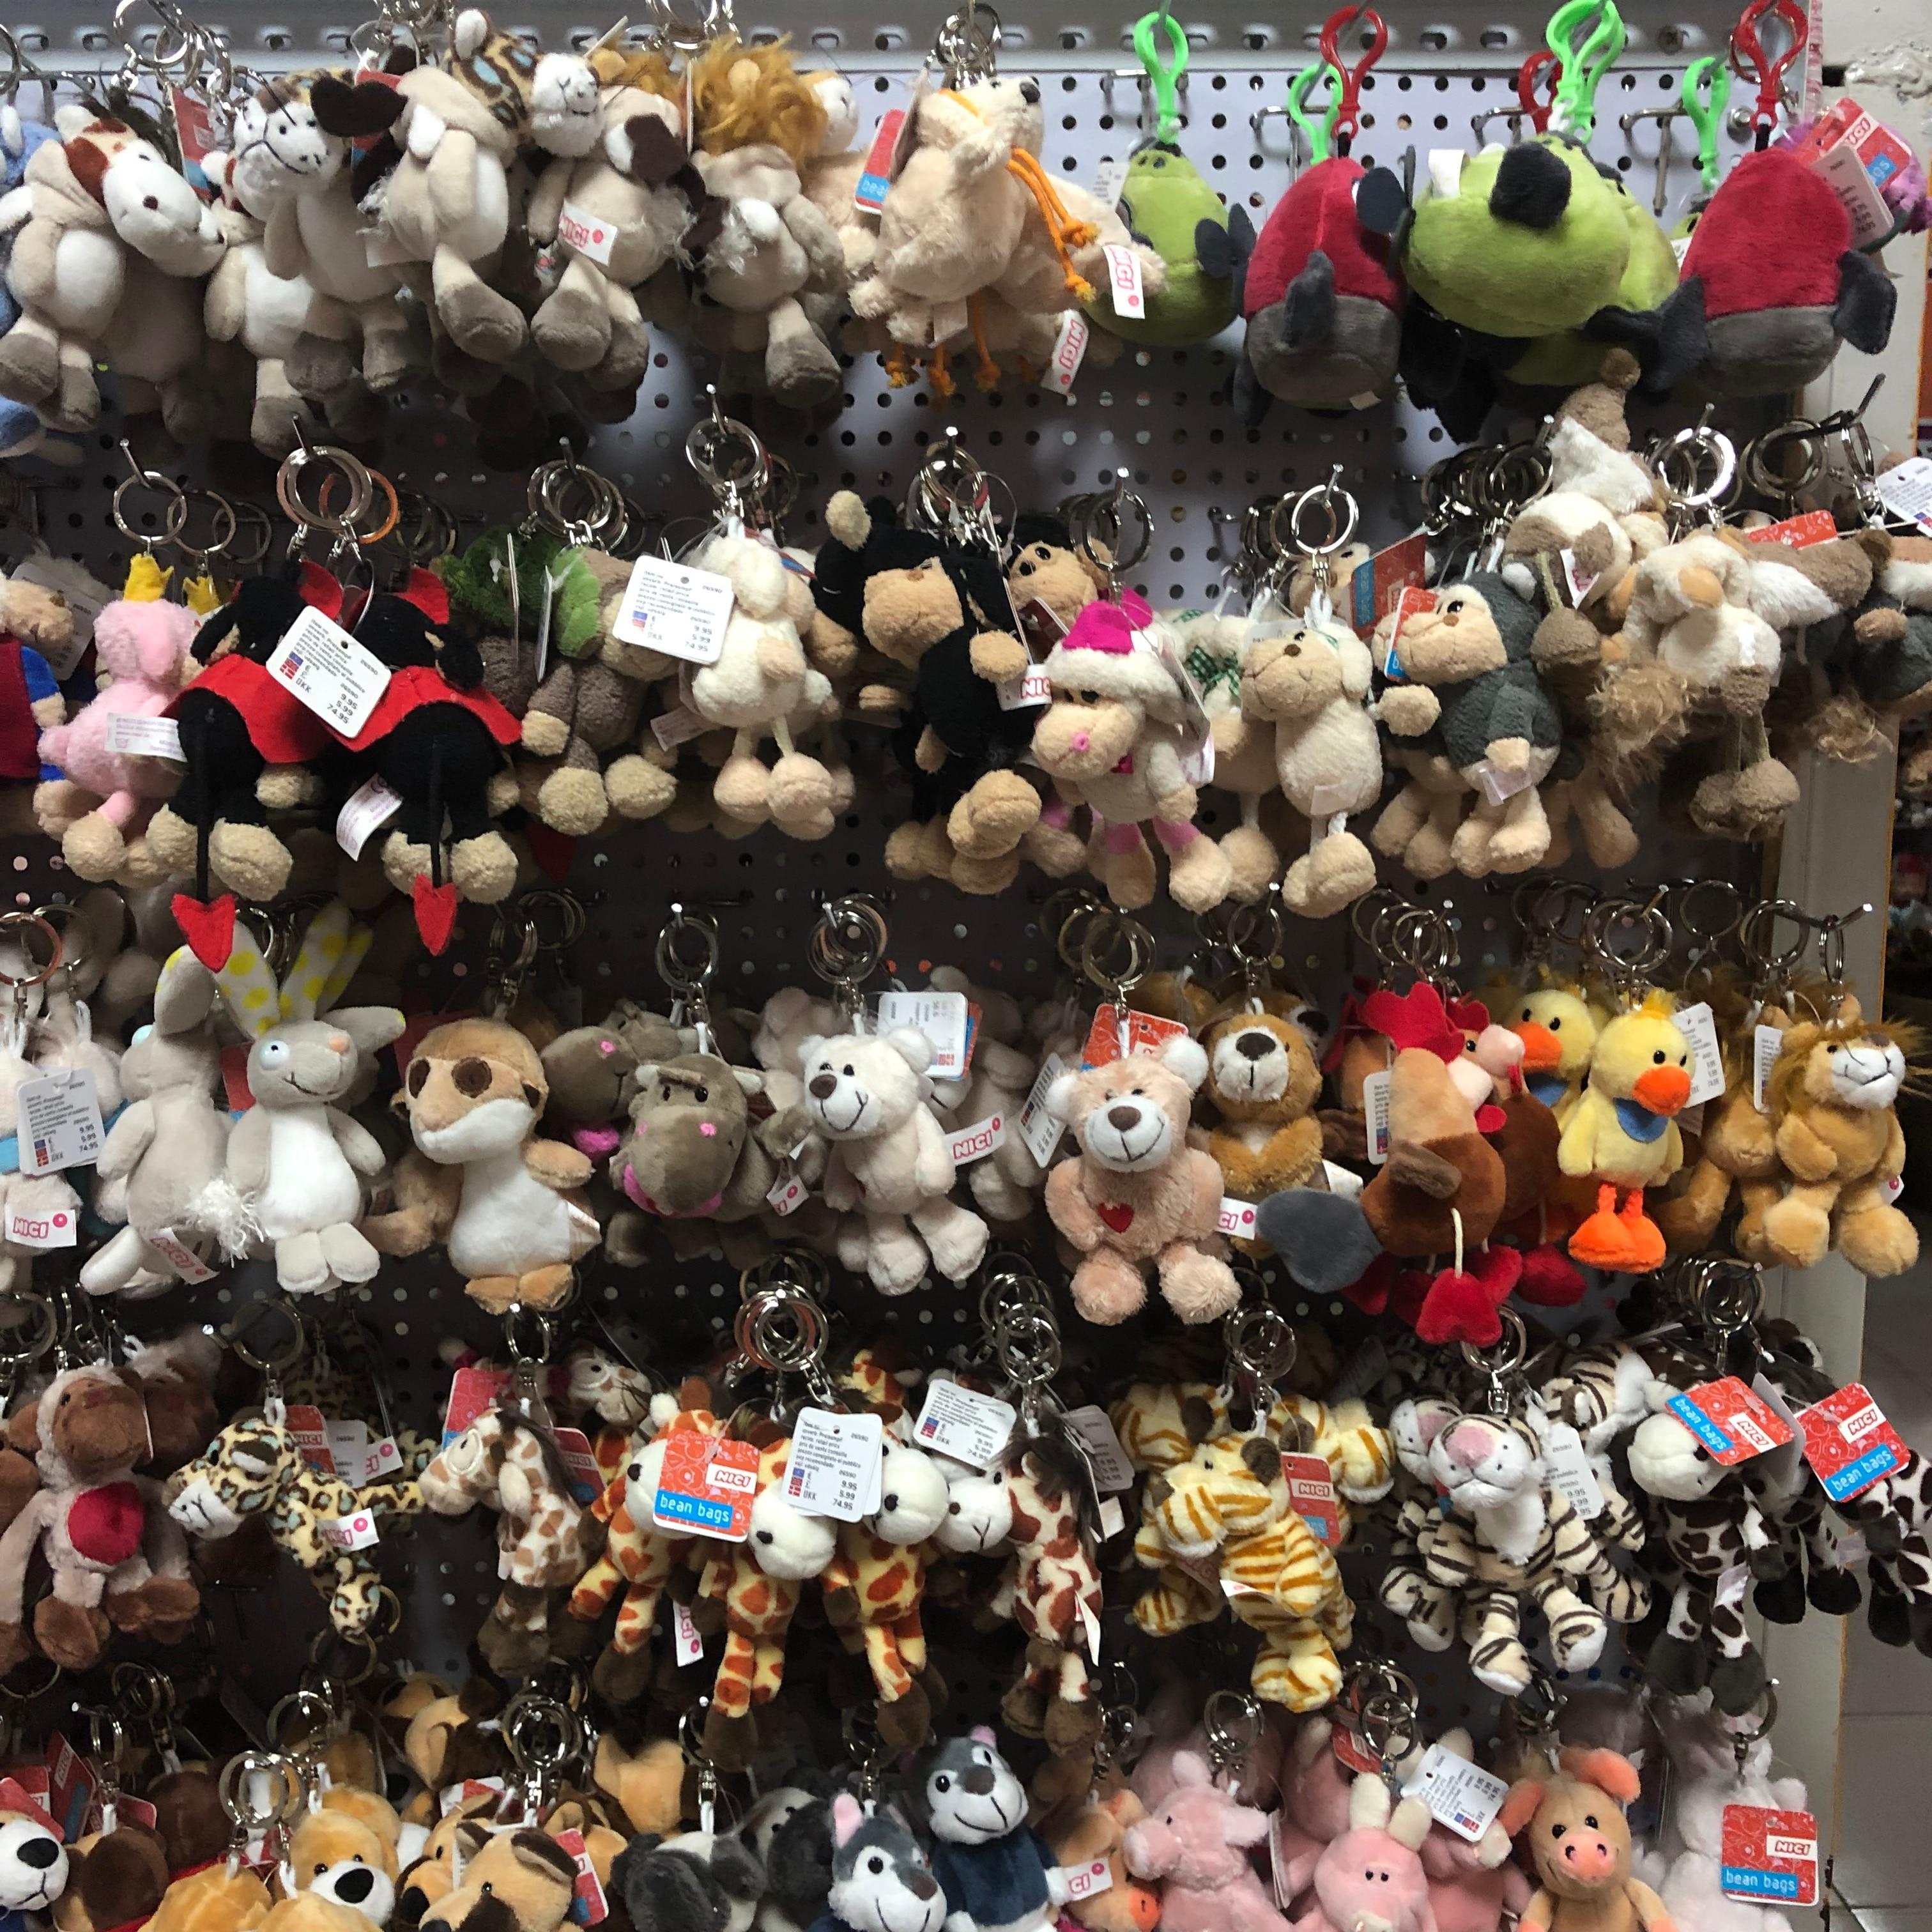 Bonito dos desenhos animados raposa animal brinquedo de pelúcia chaveiro mochila saco chaveiro pequeno presente casal shiba inu bulldog gato pinguim